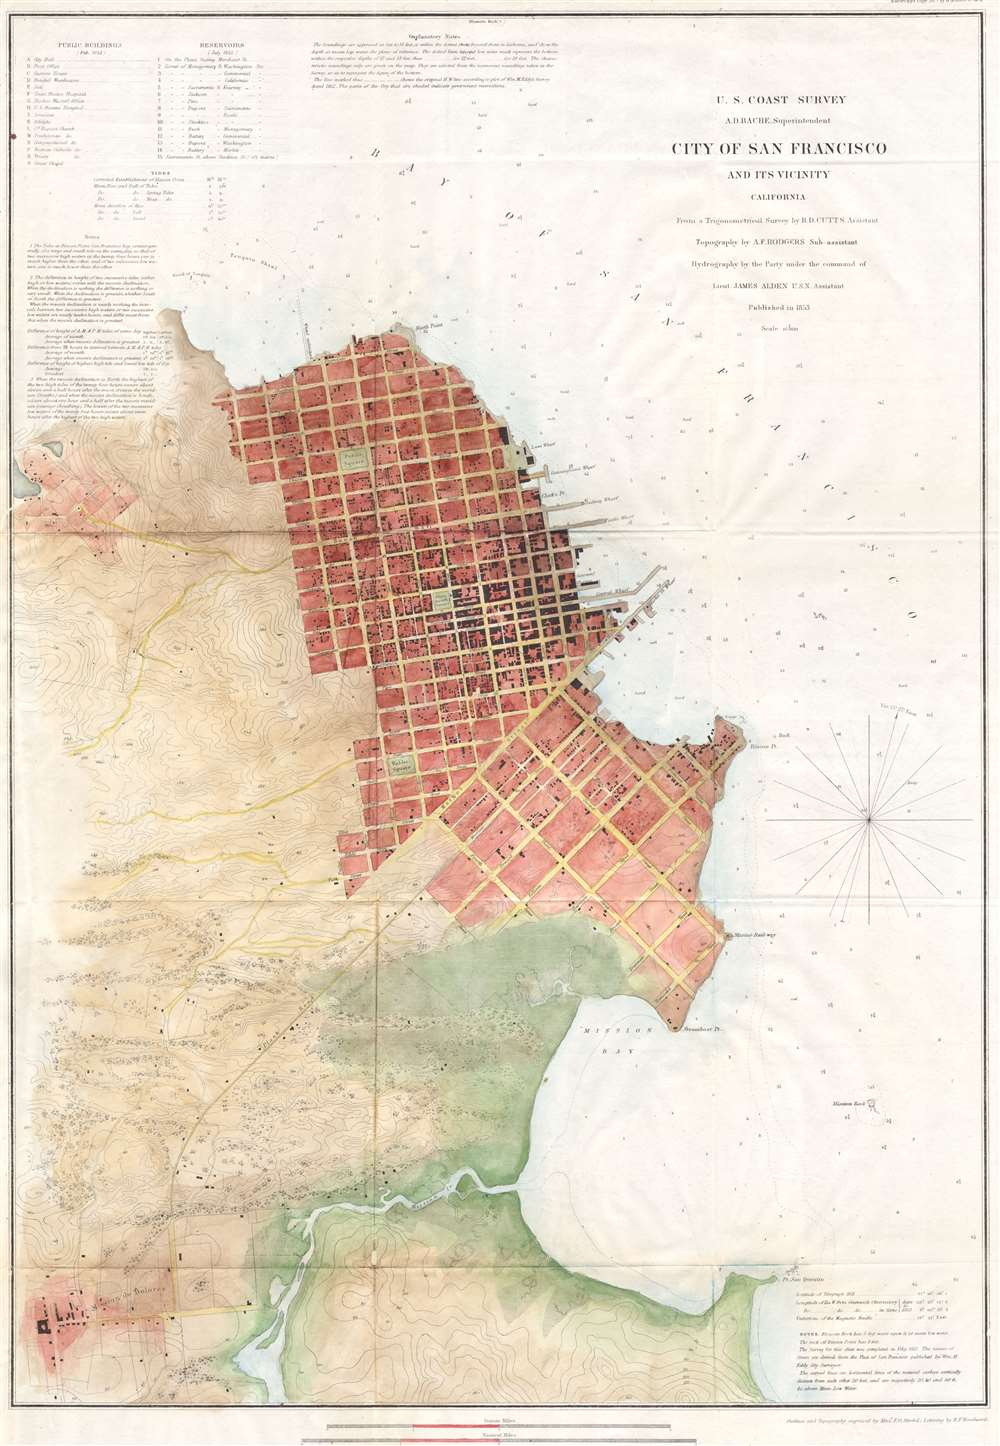 City of San Francisco and its Vicinity California. - Main View